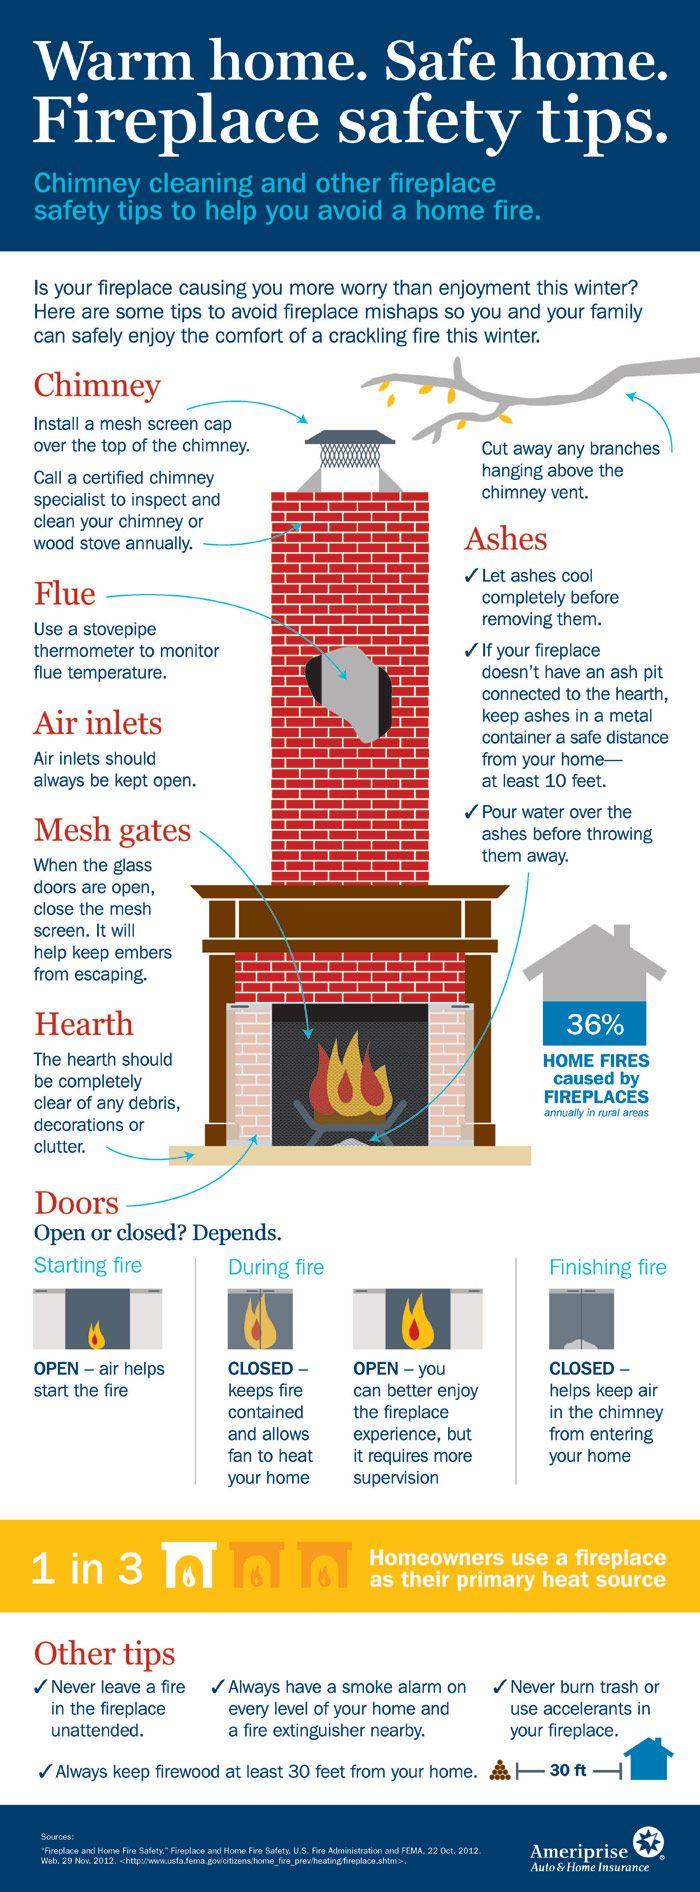 Fireplace safety tips.